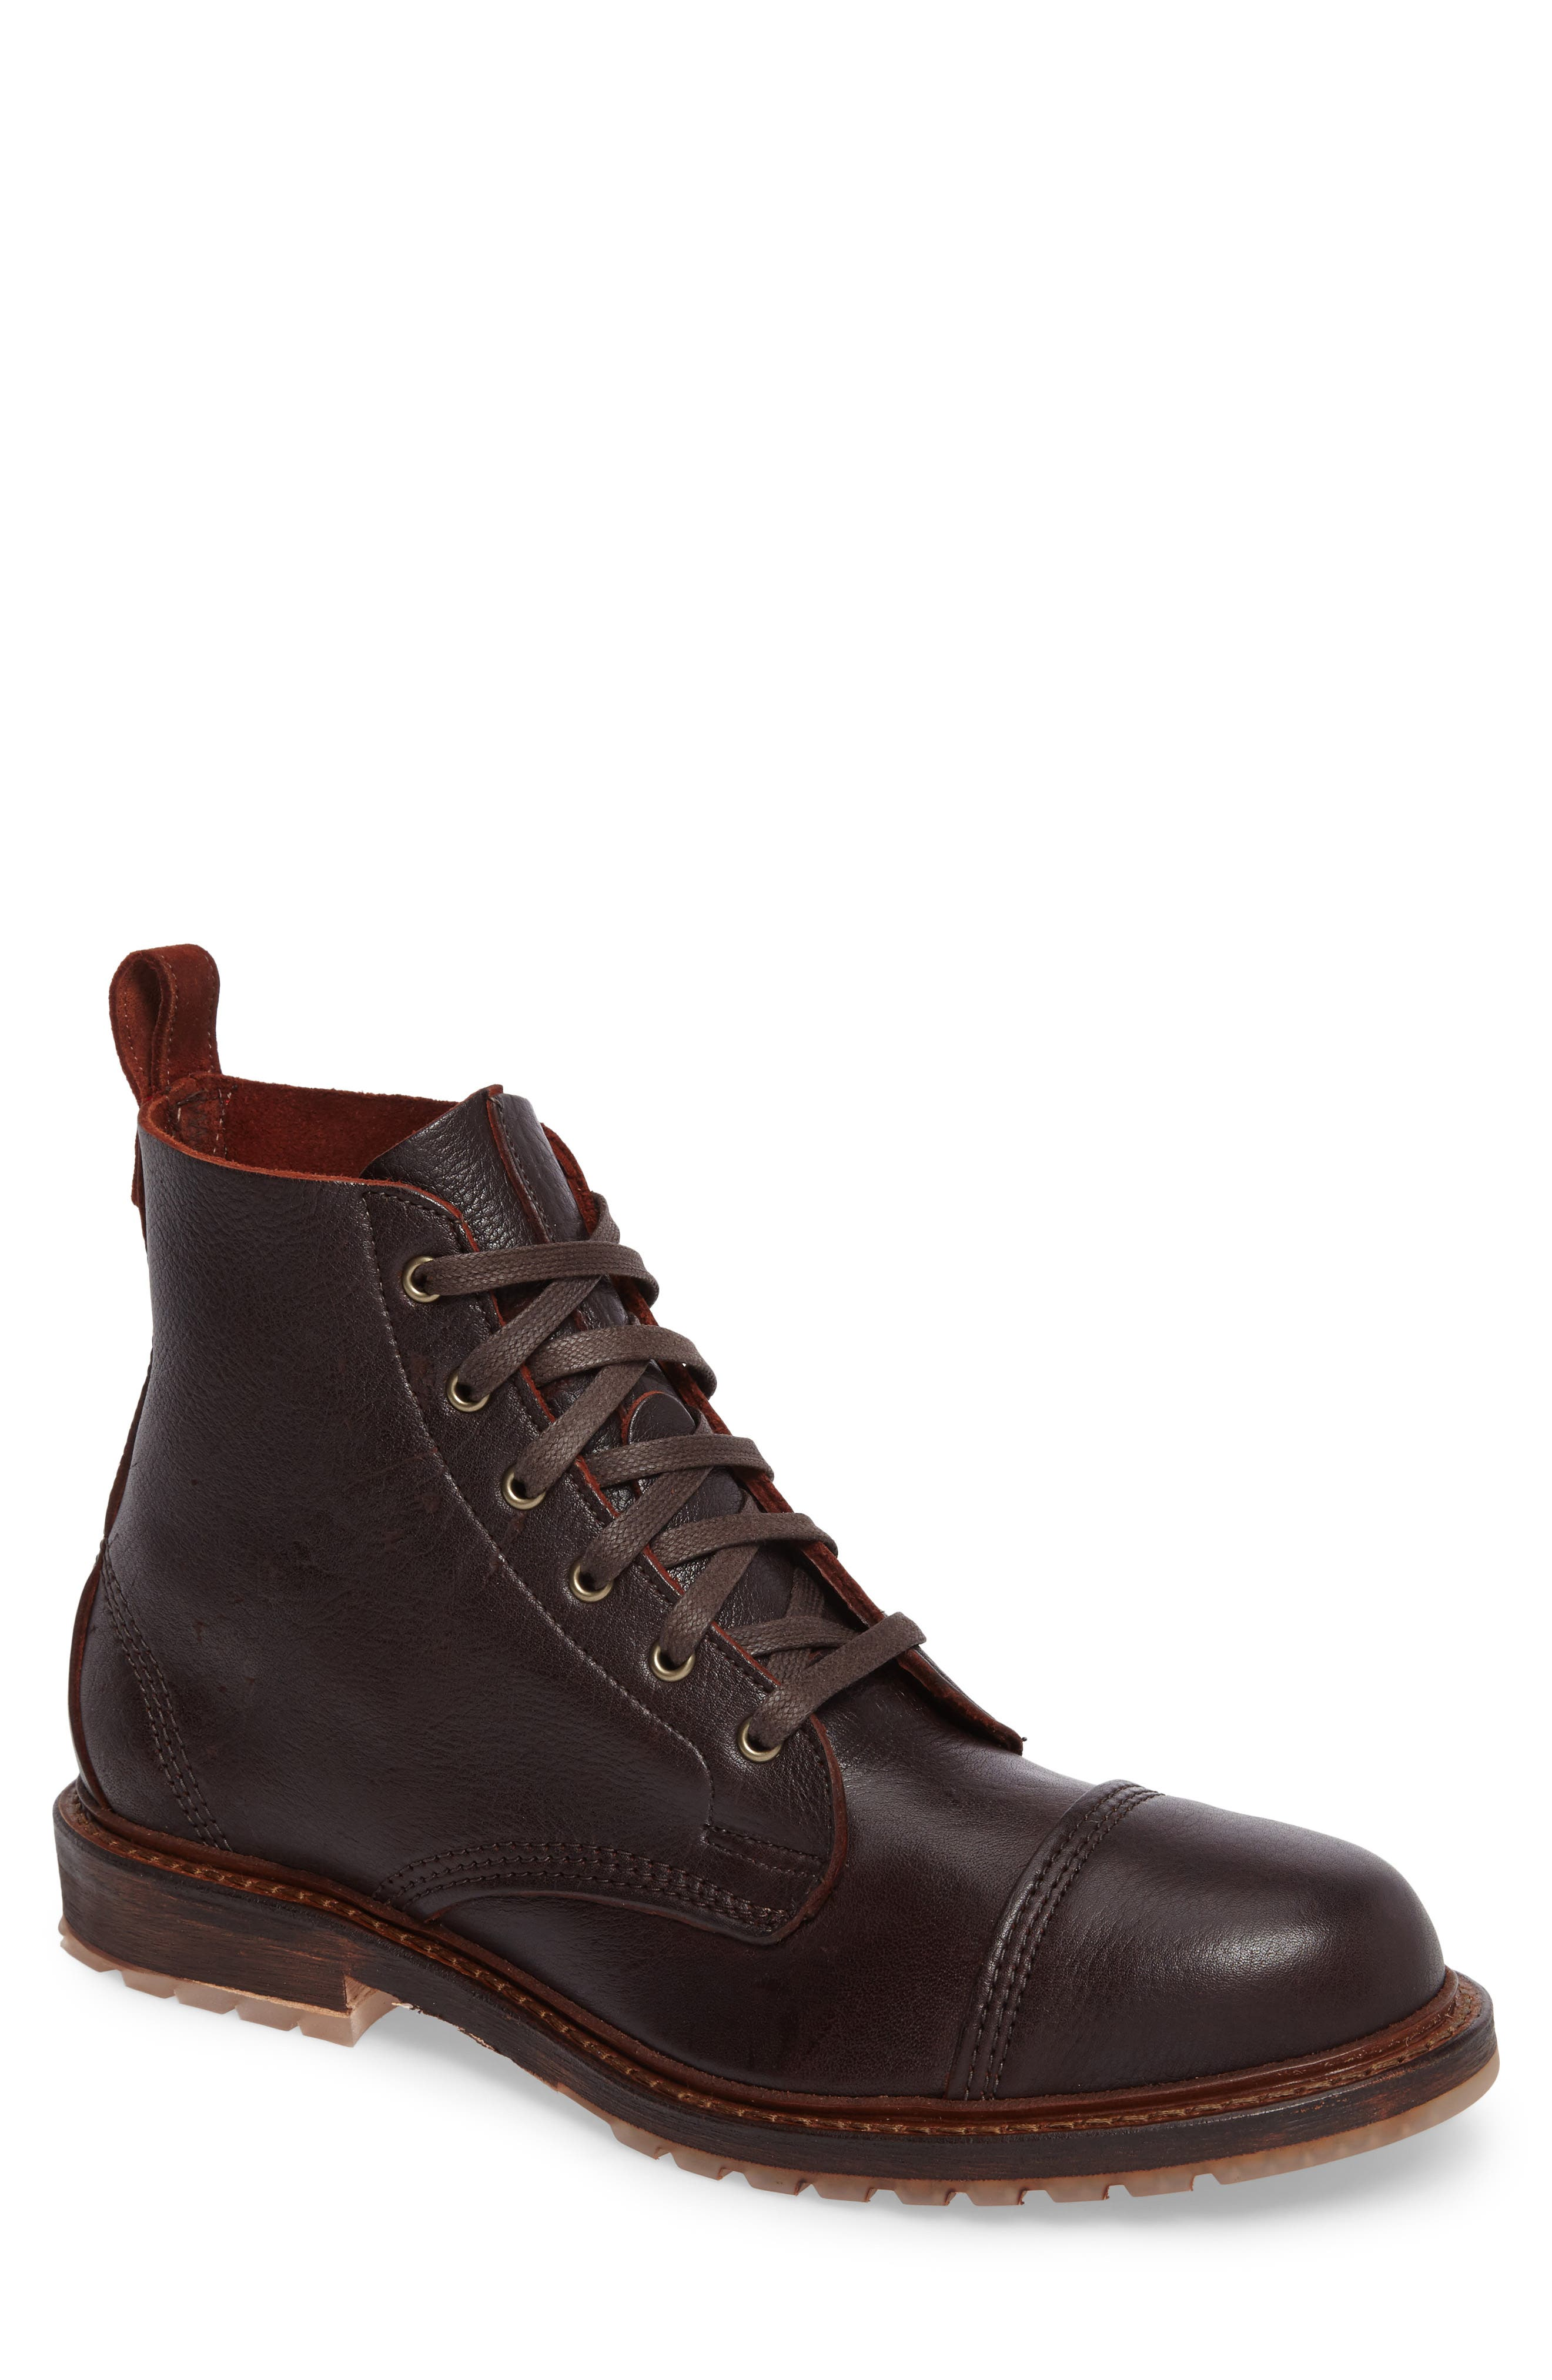 Allen Edmonds Caen Cap Toe Boot (Men)